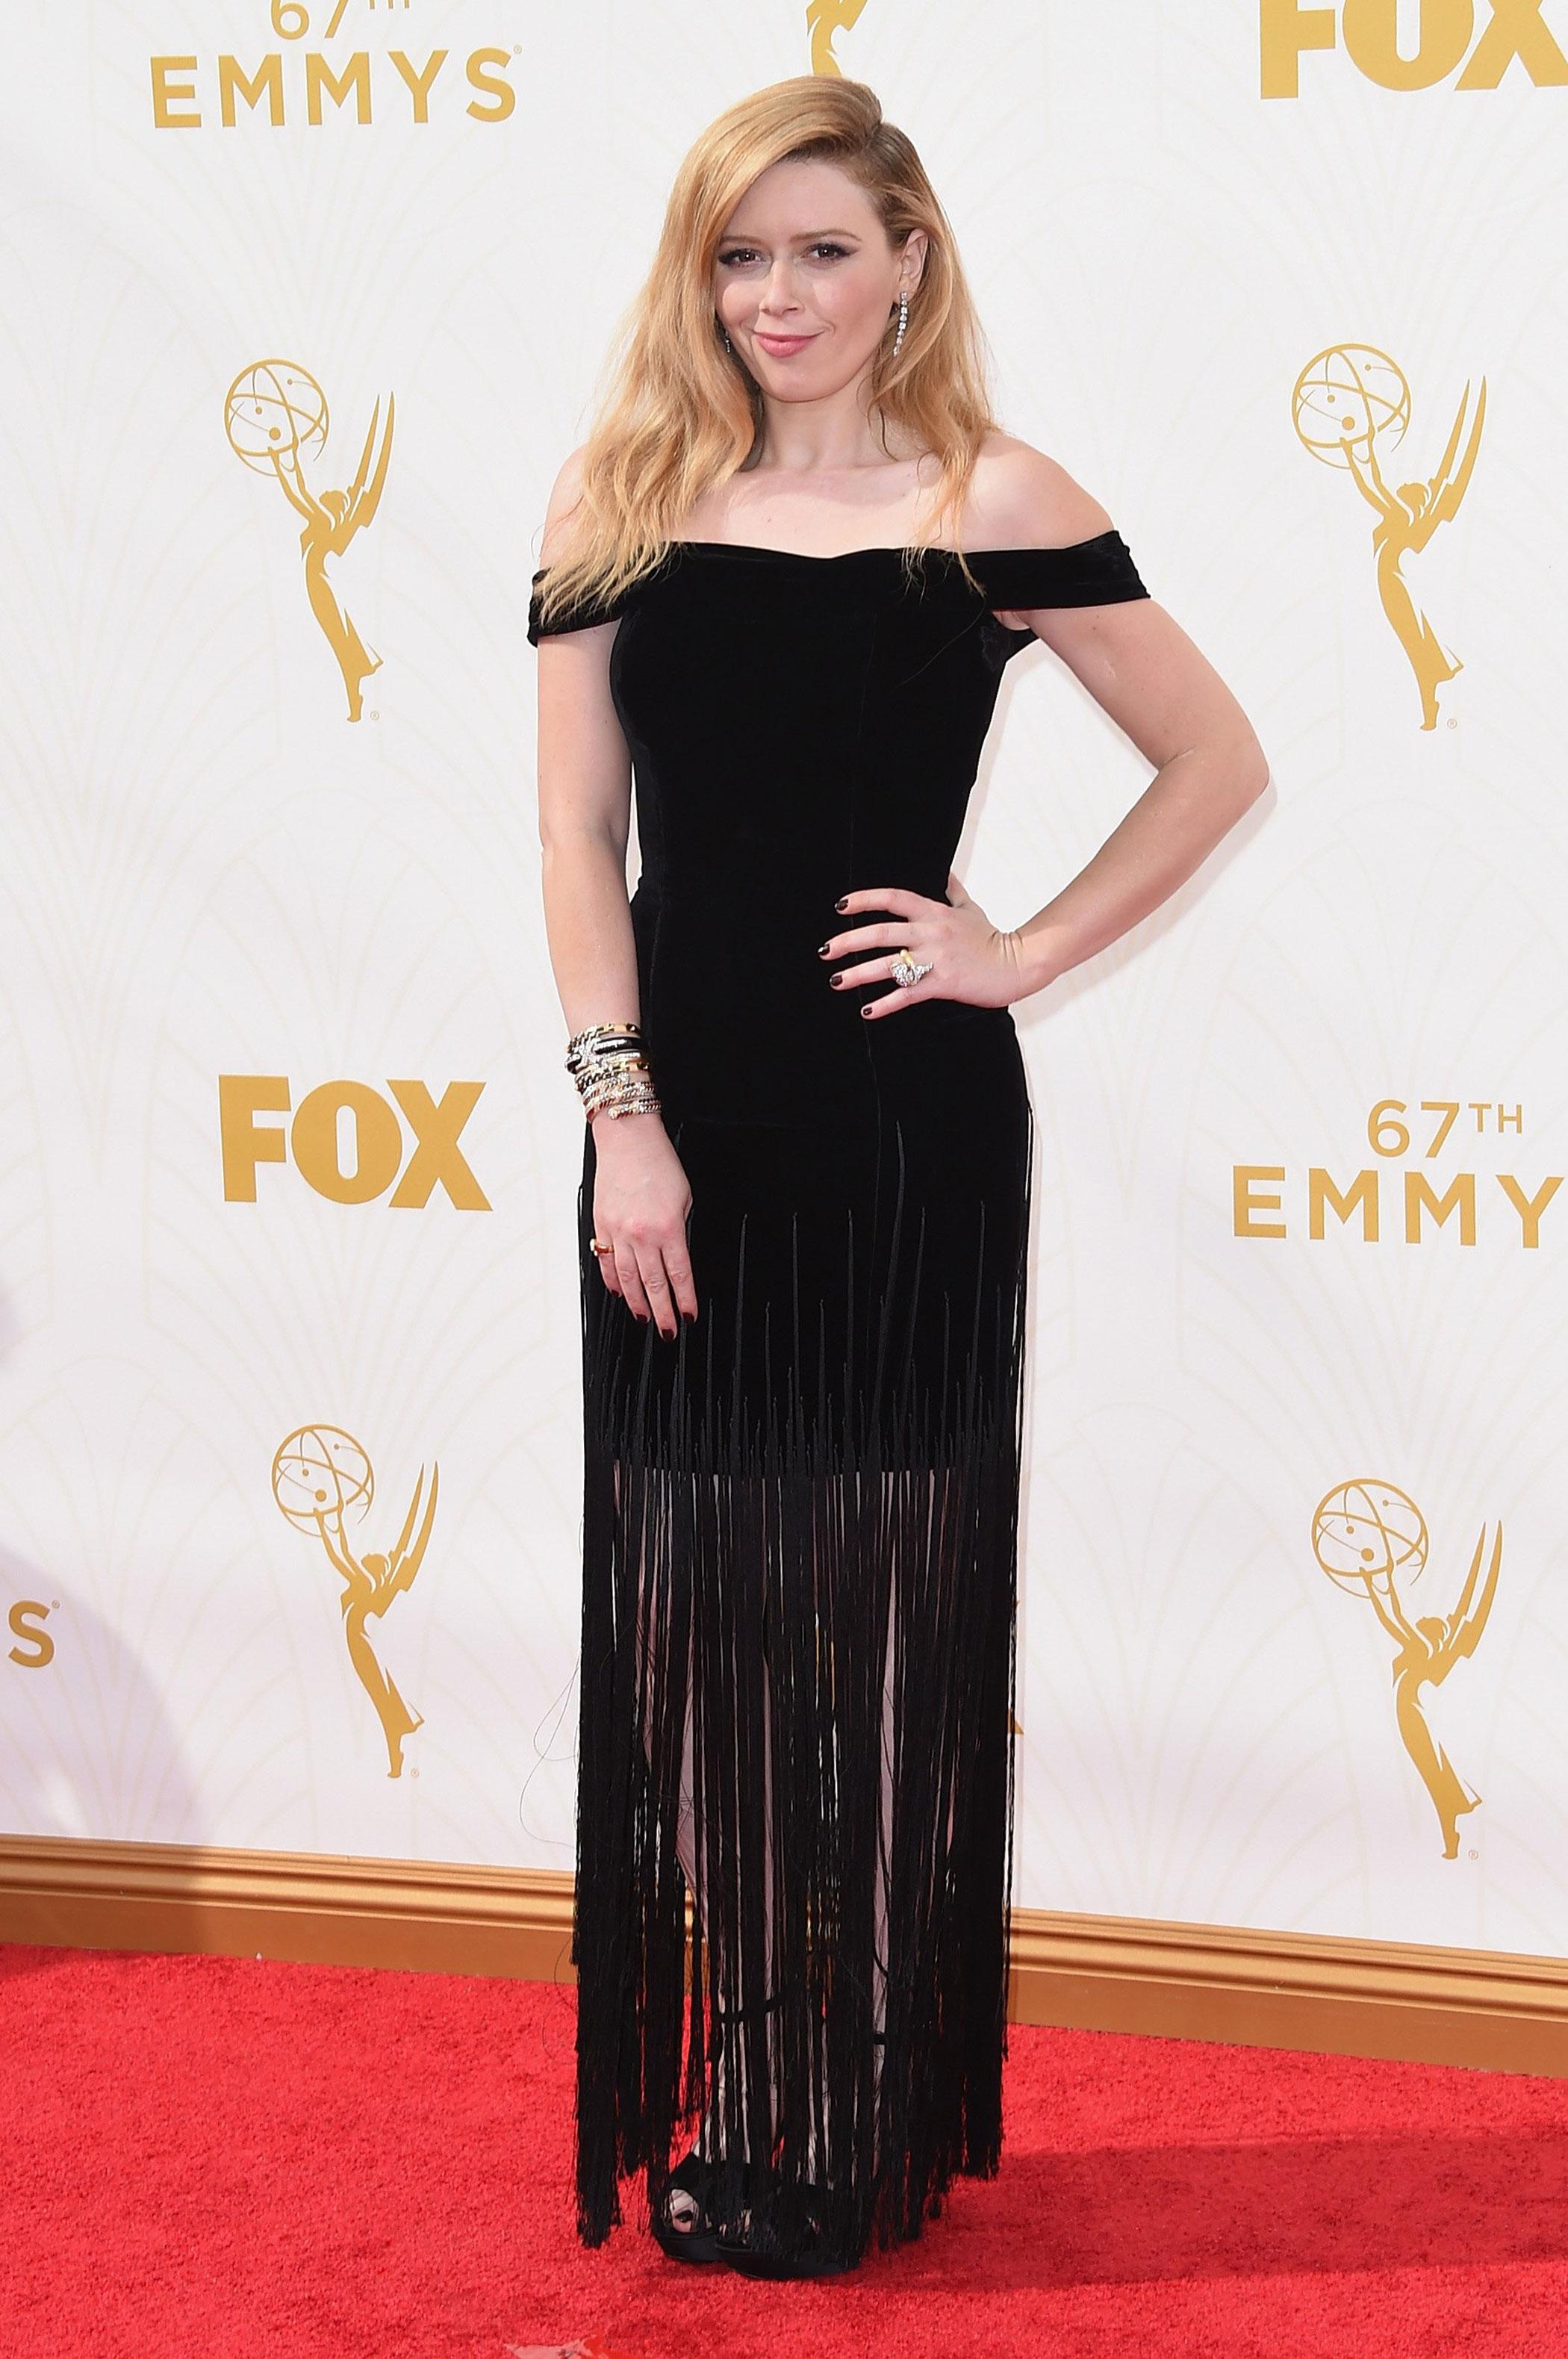 Natasha Lyonne at the 67th Emmy Award on Sept. 20, 2015 in Los Angeles.